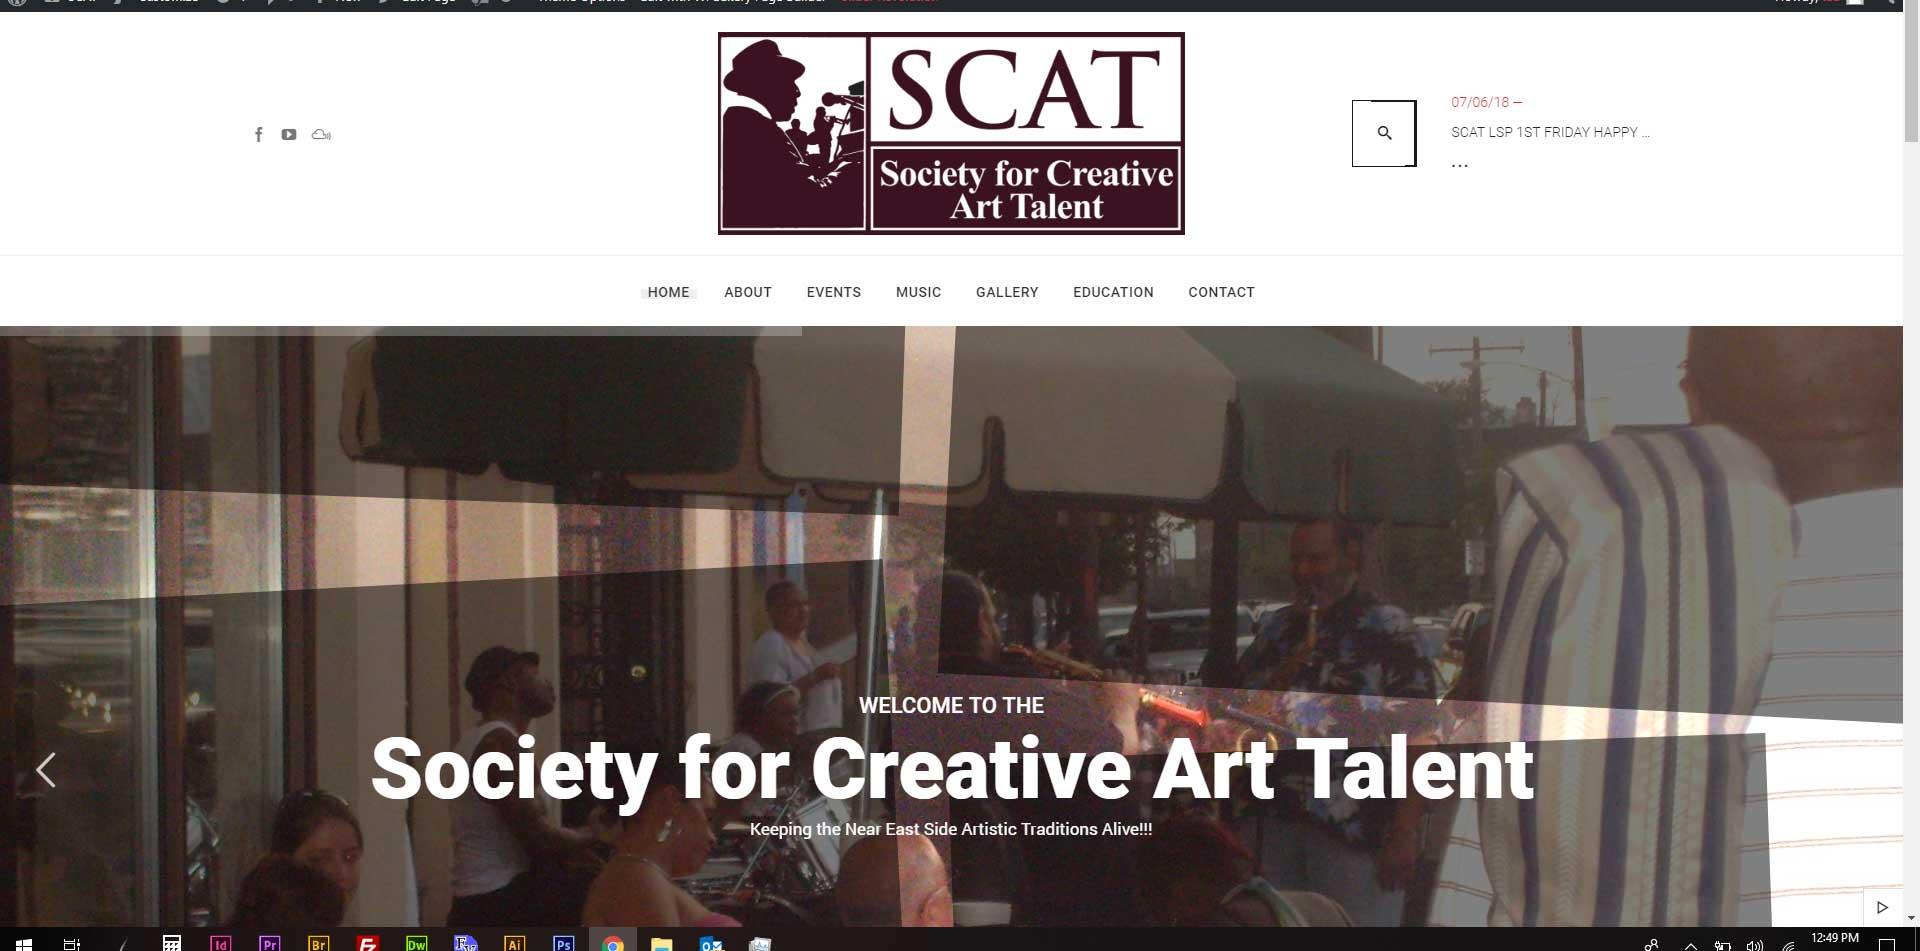 Society of Creative Art Talent website